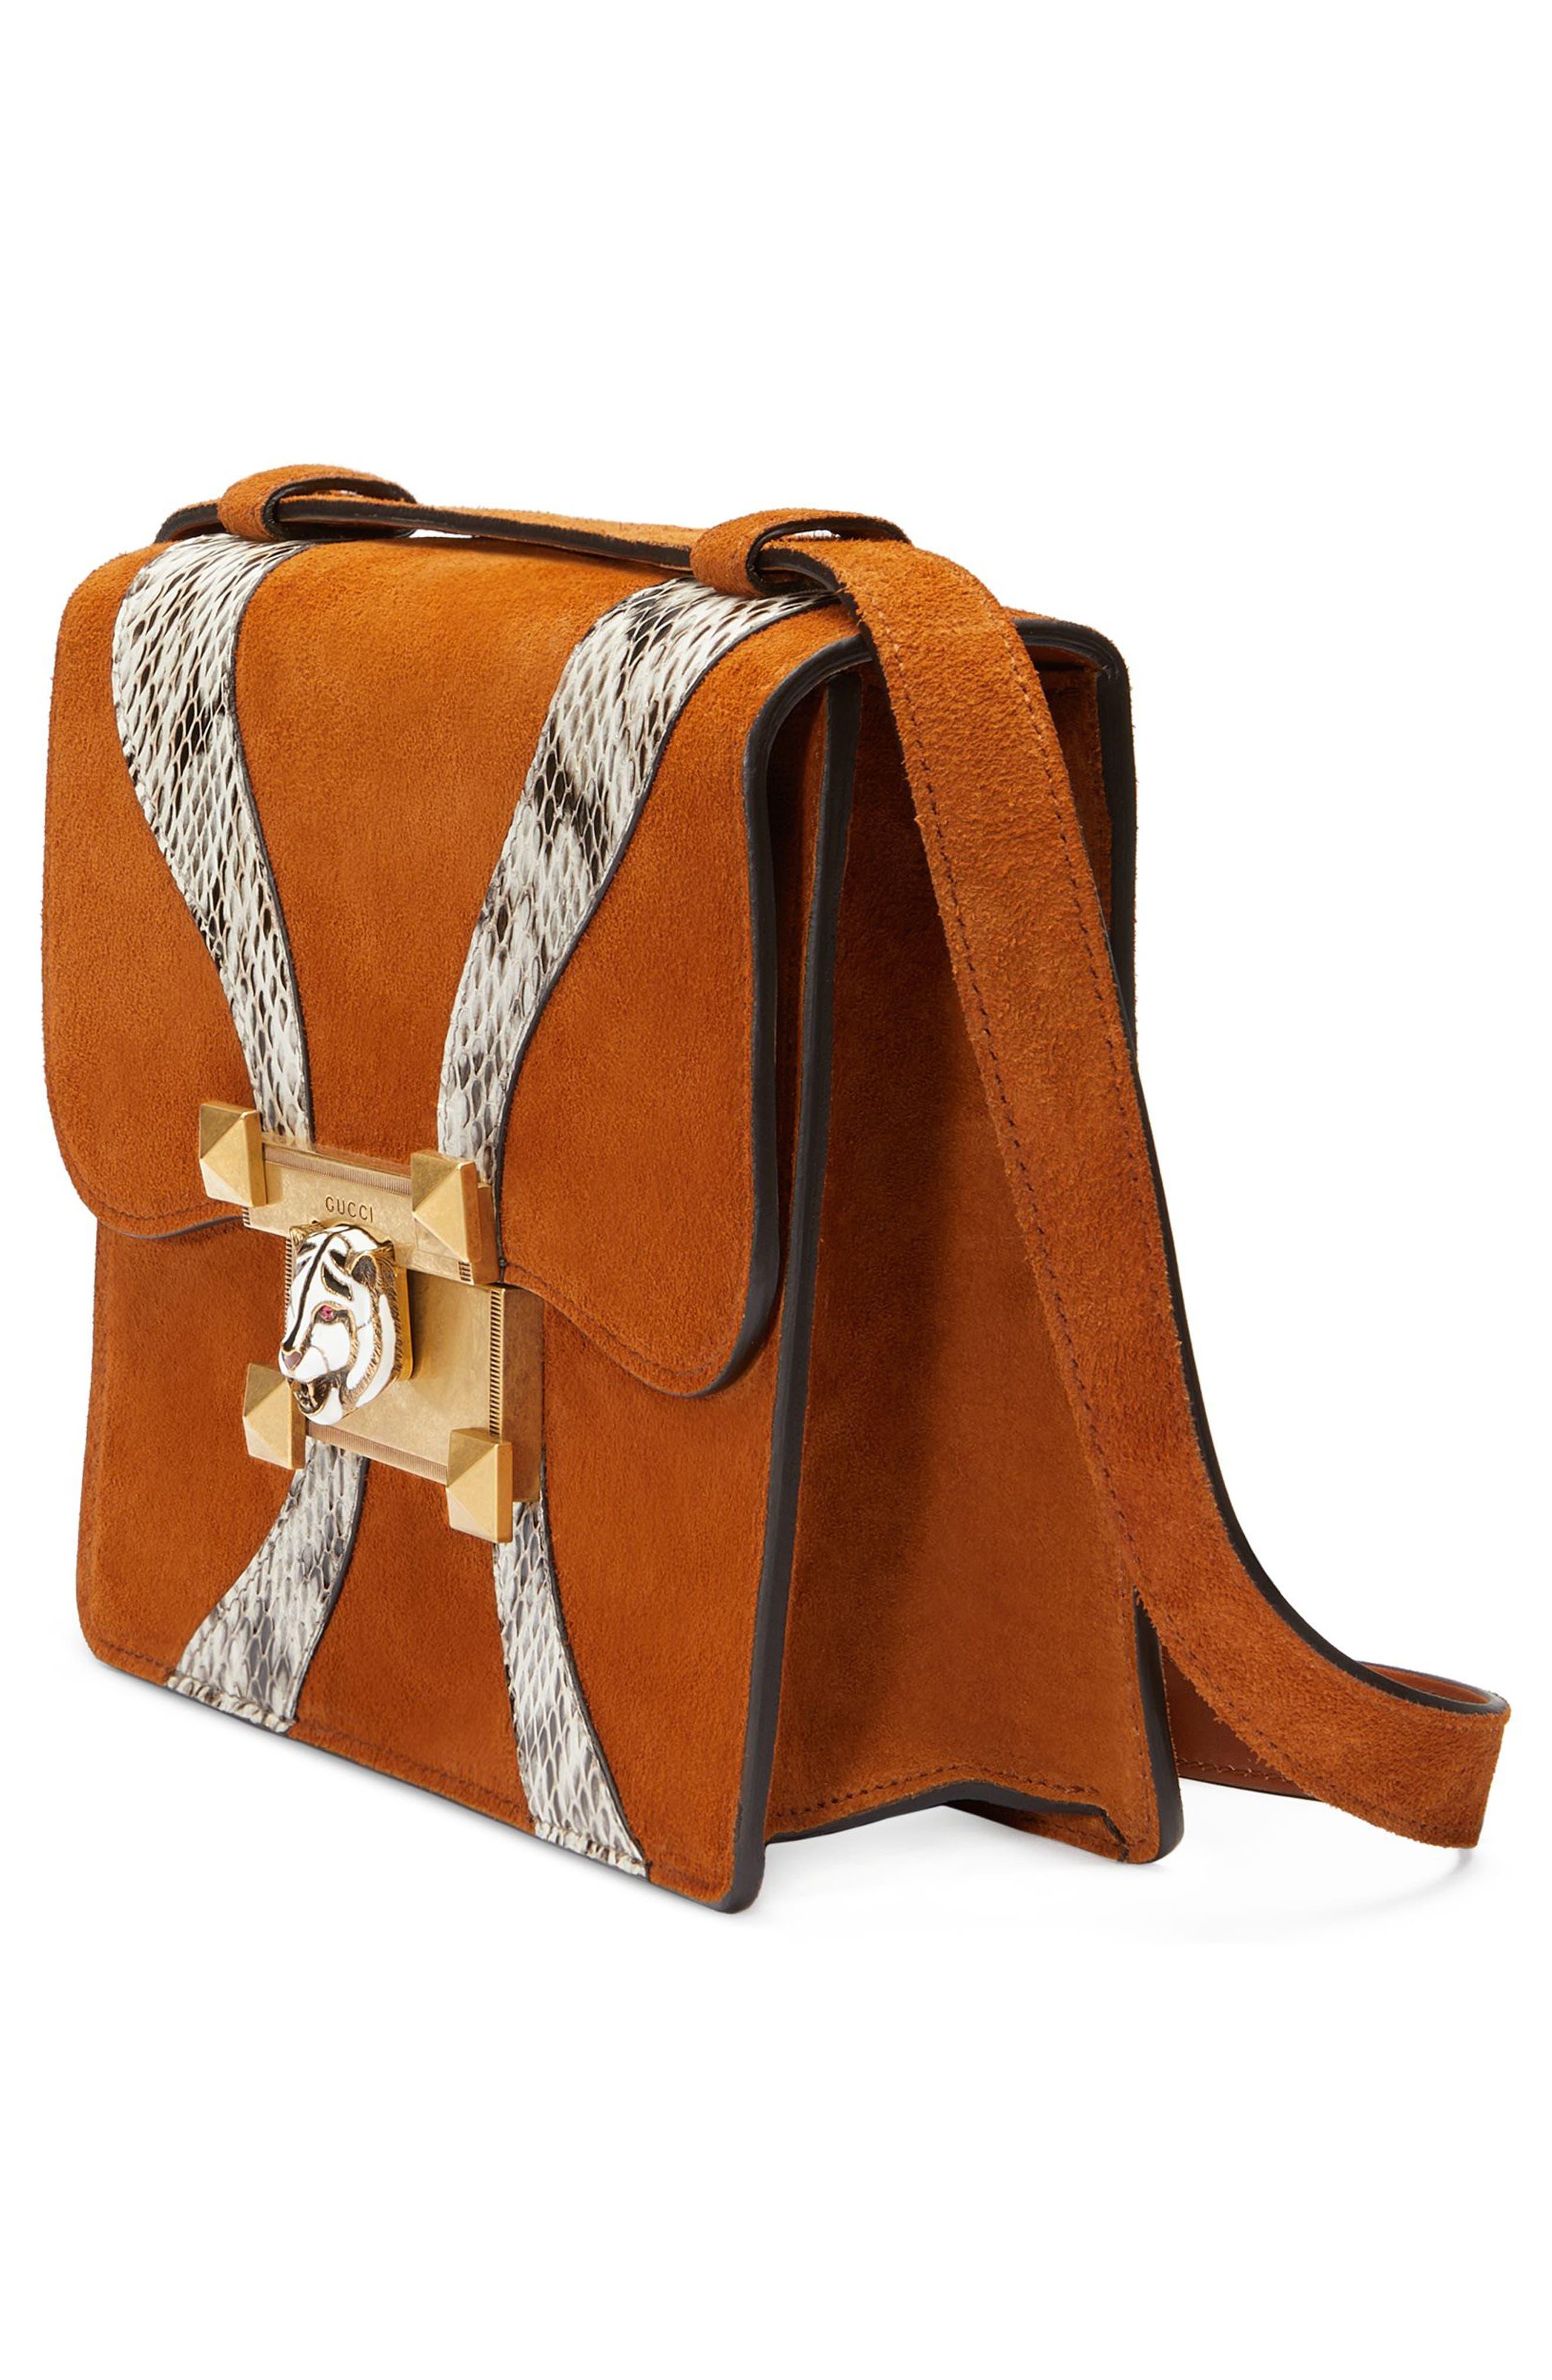 Osiride Suede & Genuine Snakeskin Shoulder Bag,                             Alternate thumbnail 4, color,                             Bright Cuir/ Roccia